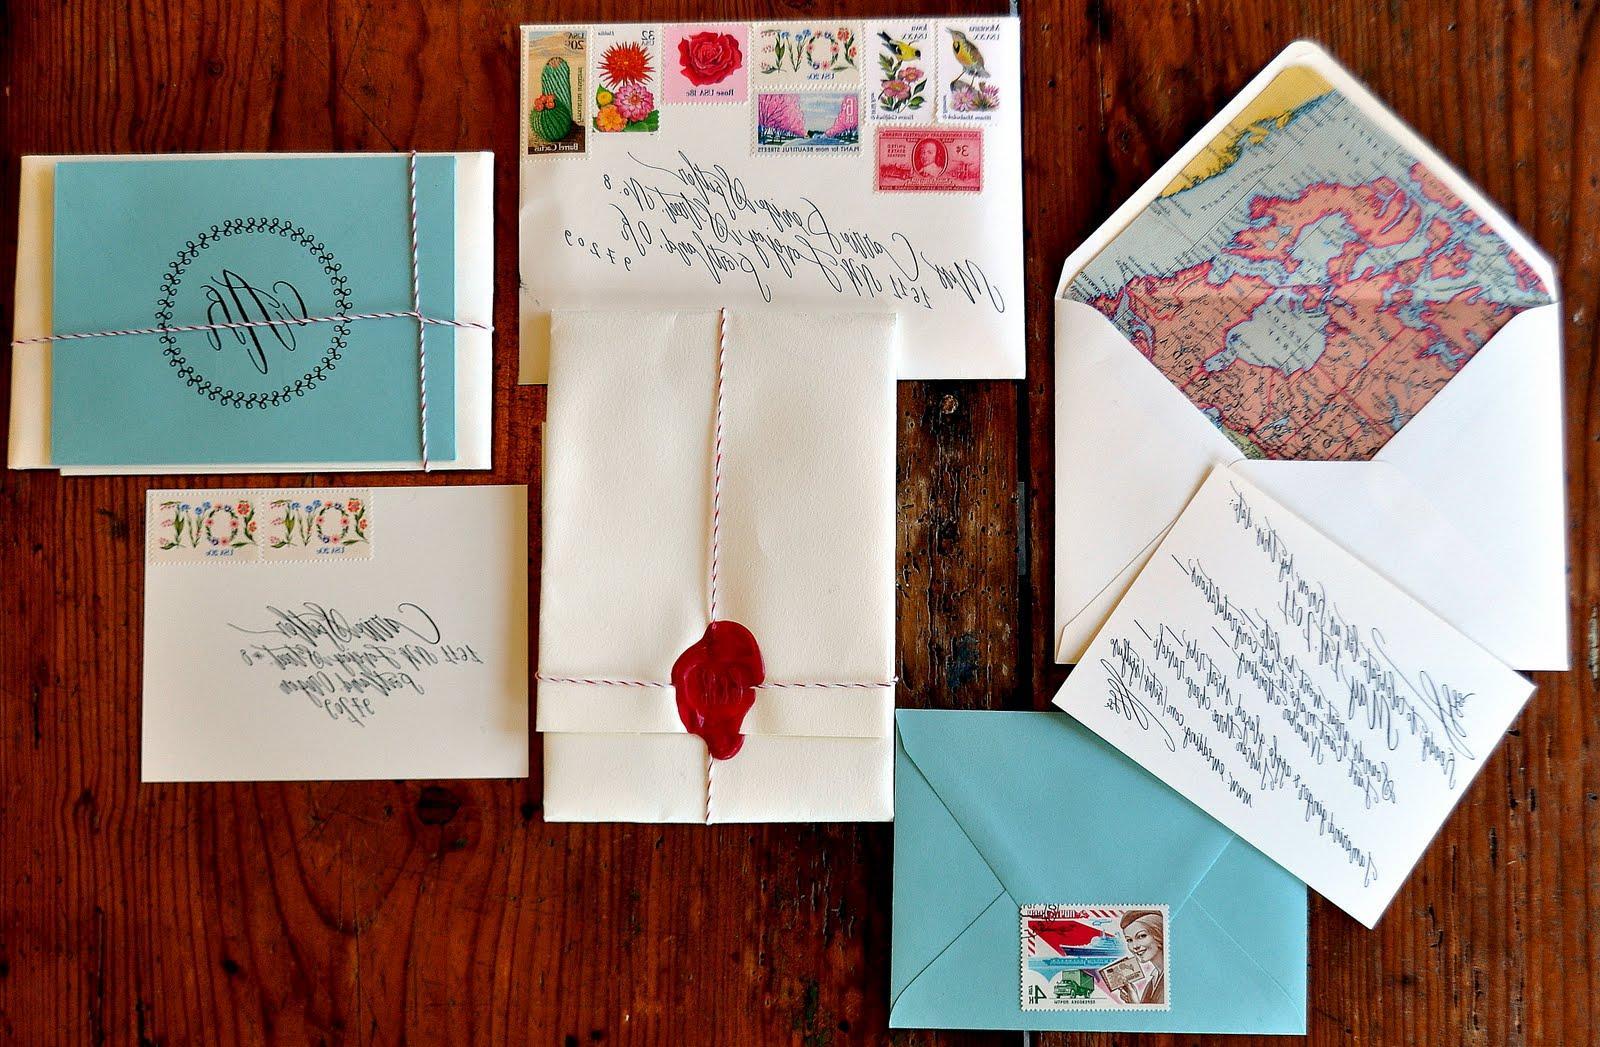 invitations that she